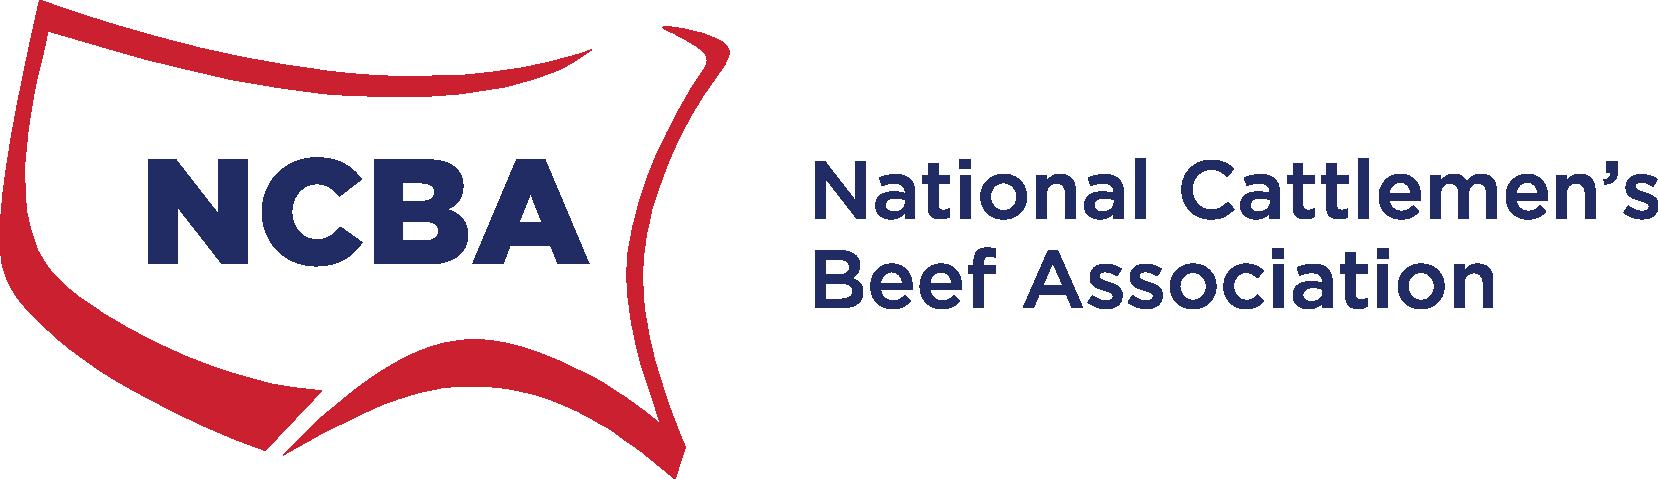 NCBA Association LMS